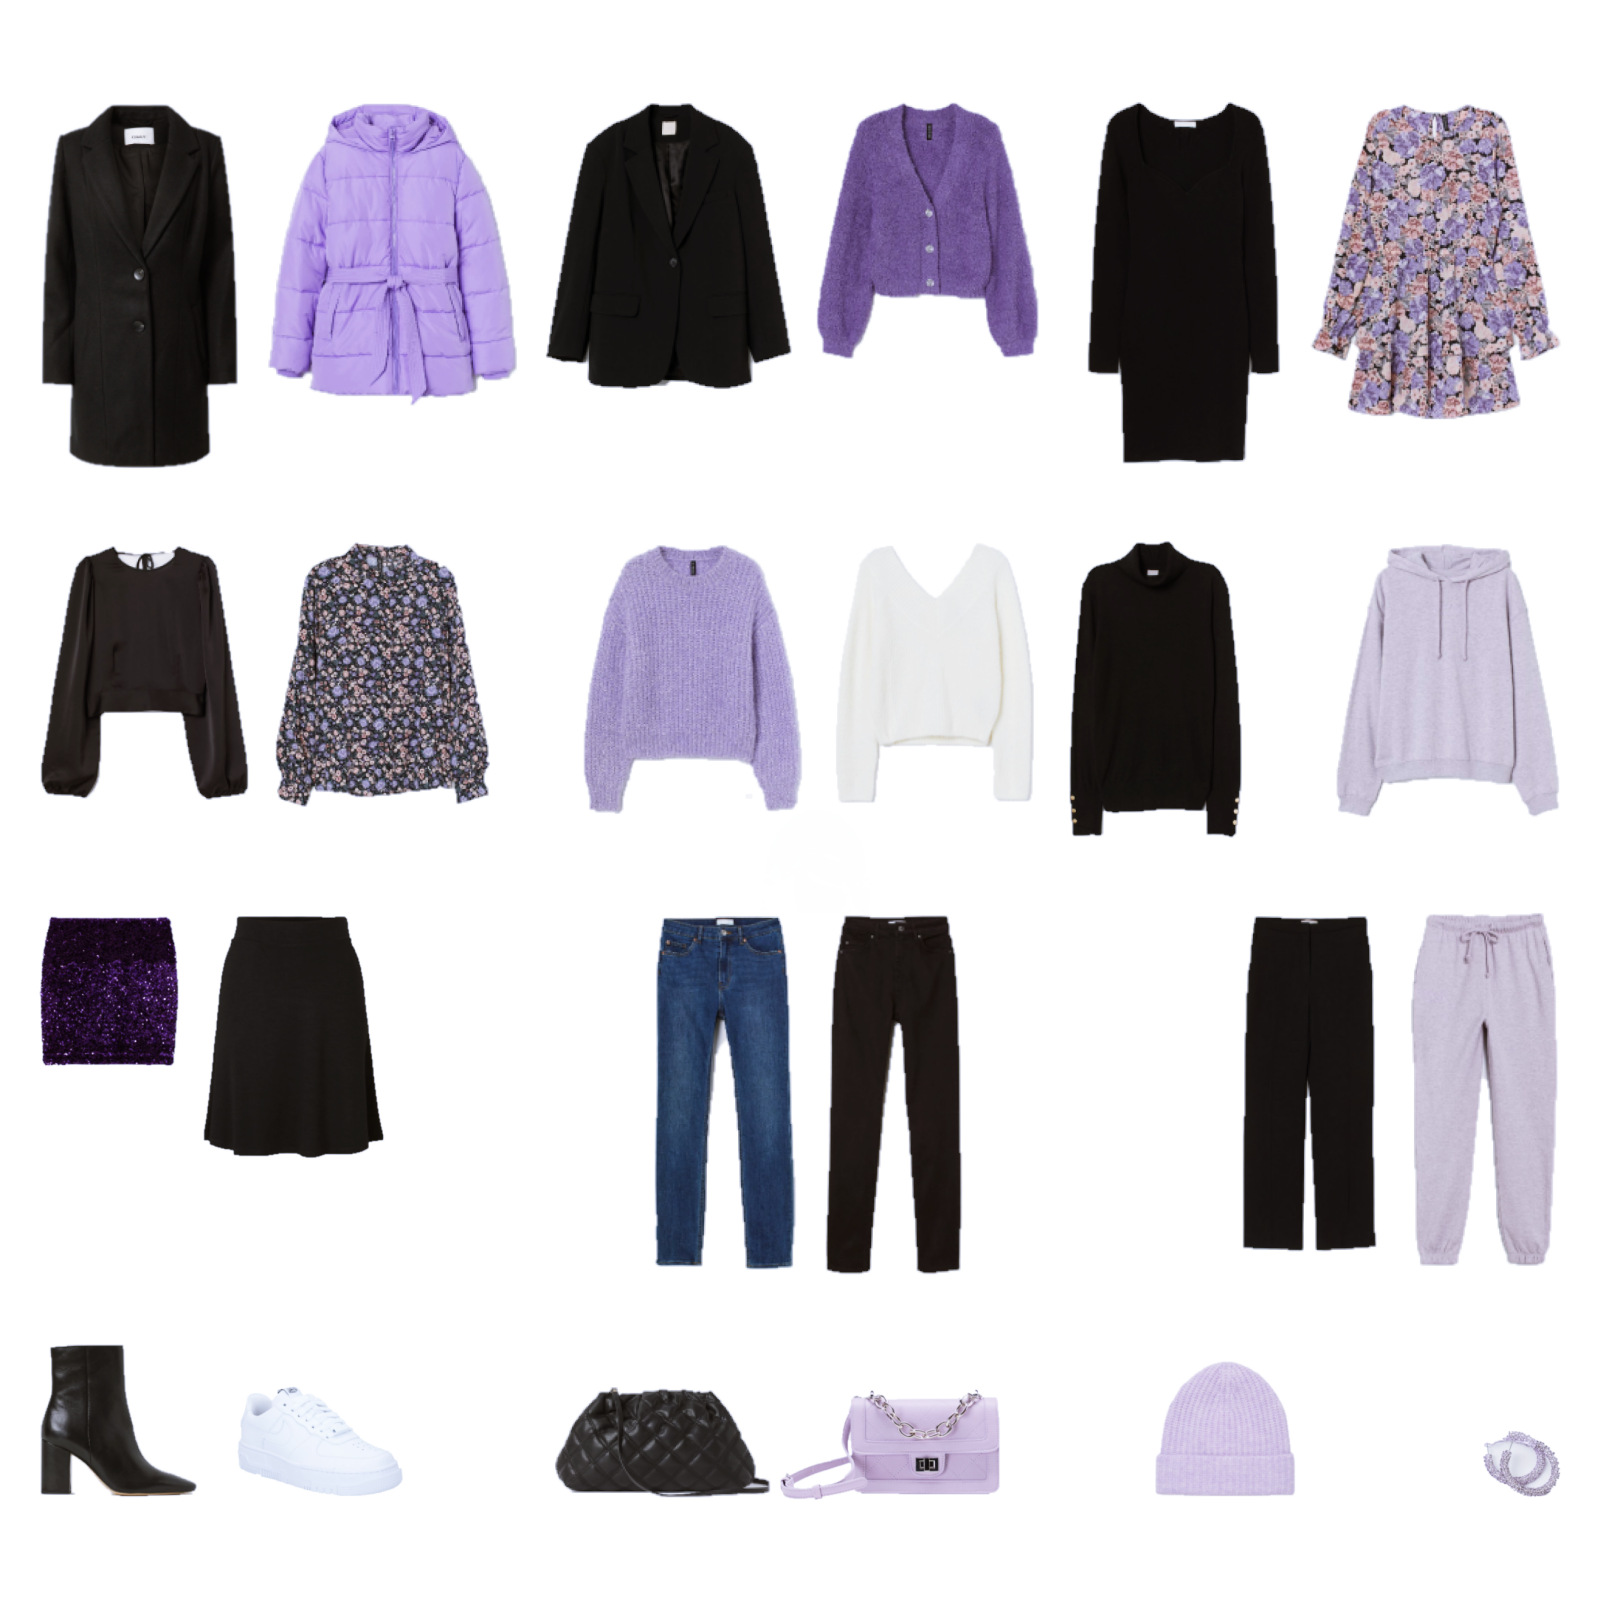 Advent Capsule Wardrobe 2020